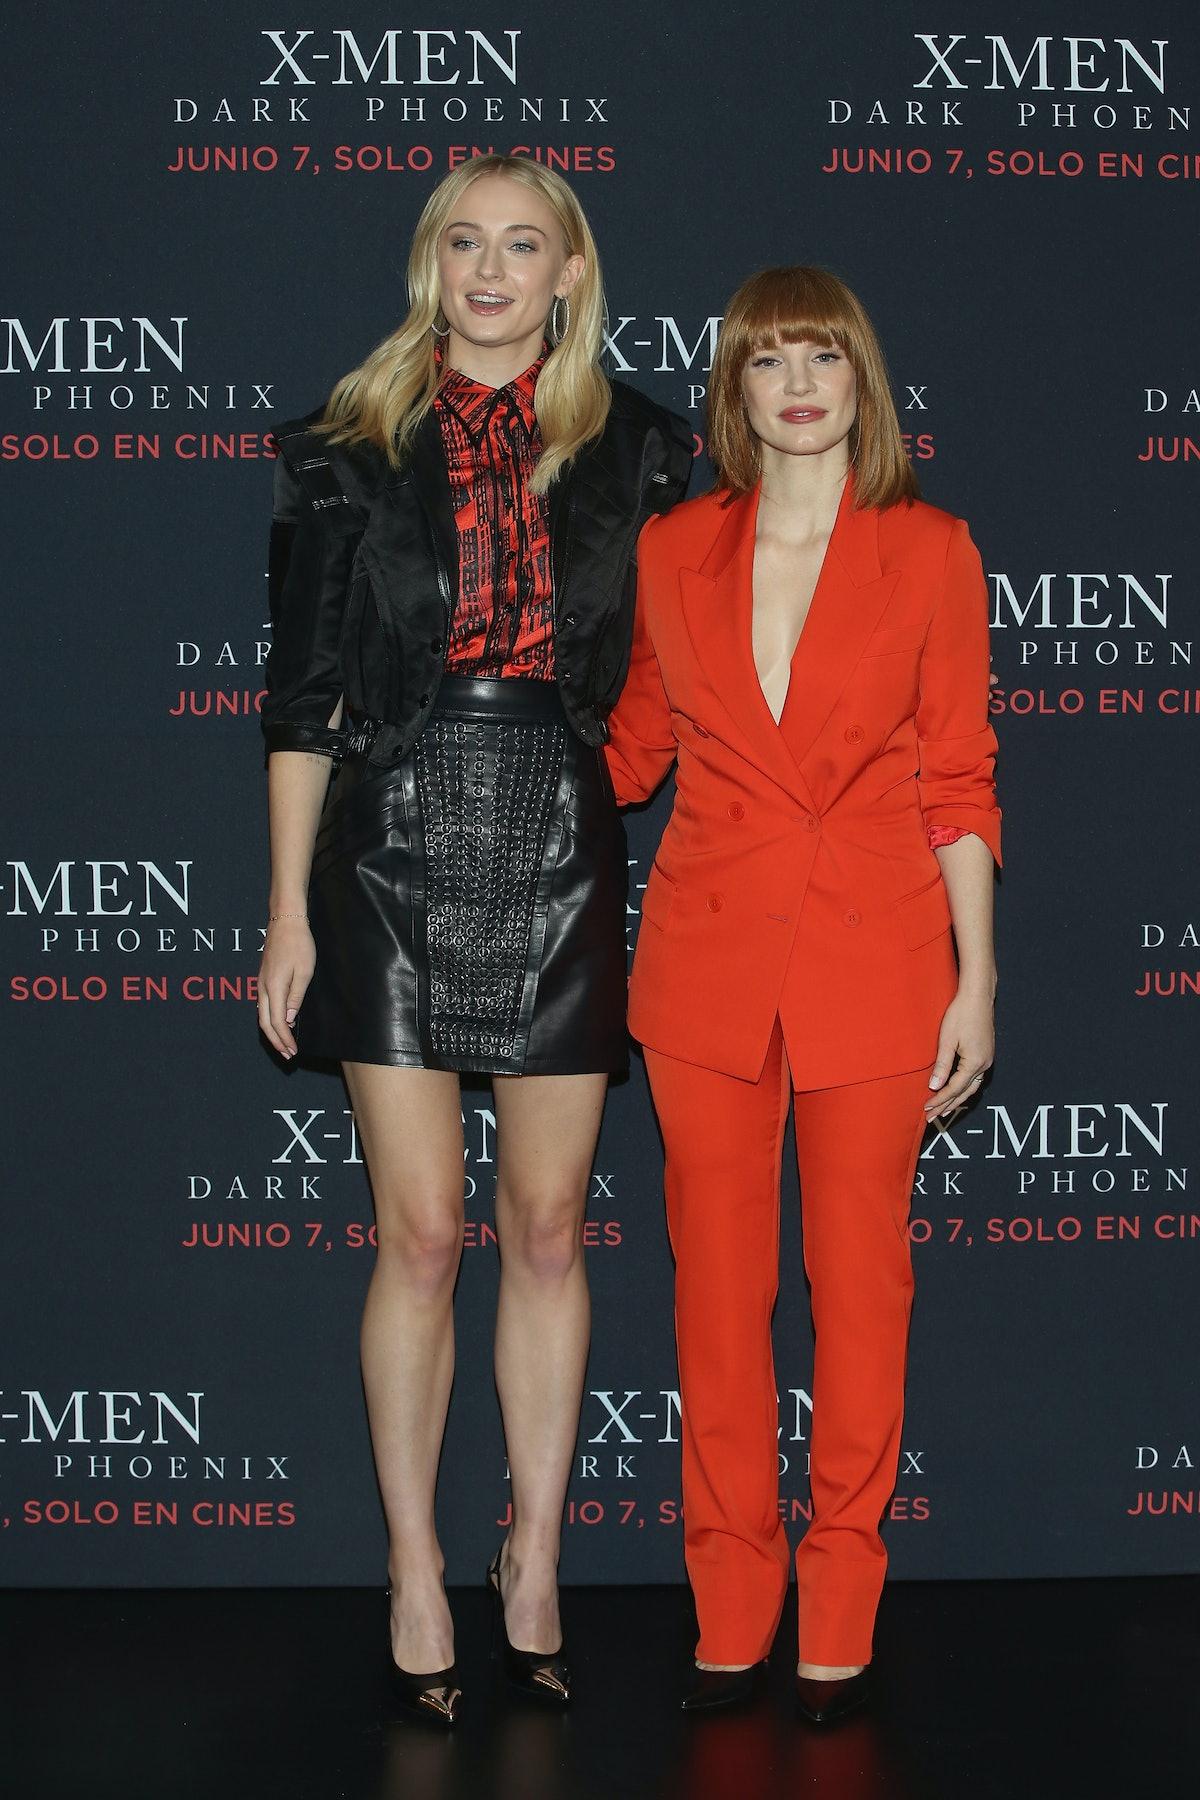 X-Men Dark Phoenix - Press Conference